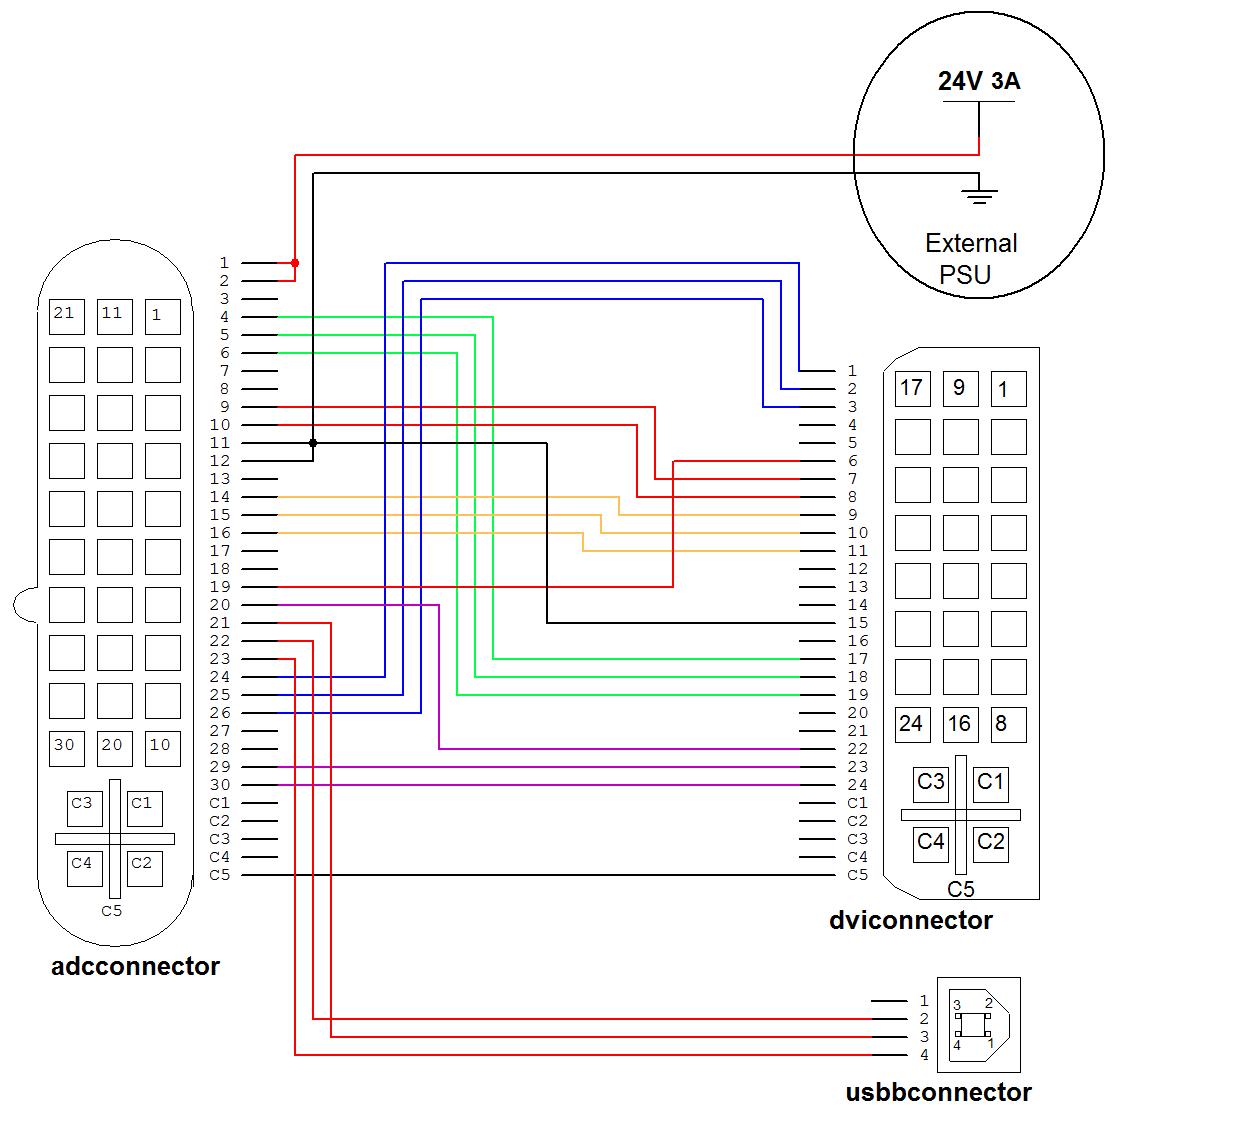 Hdmi Cable Pinout Diagram - efcaviation.com on welding diagram pdf, plumbing diagram pdf, data sheet pdf, battery diagram pdf, power pdf, body diagram pdf,